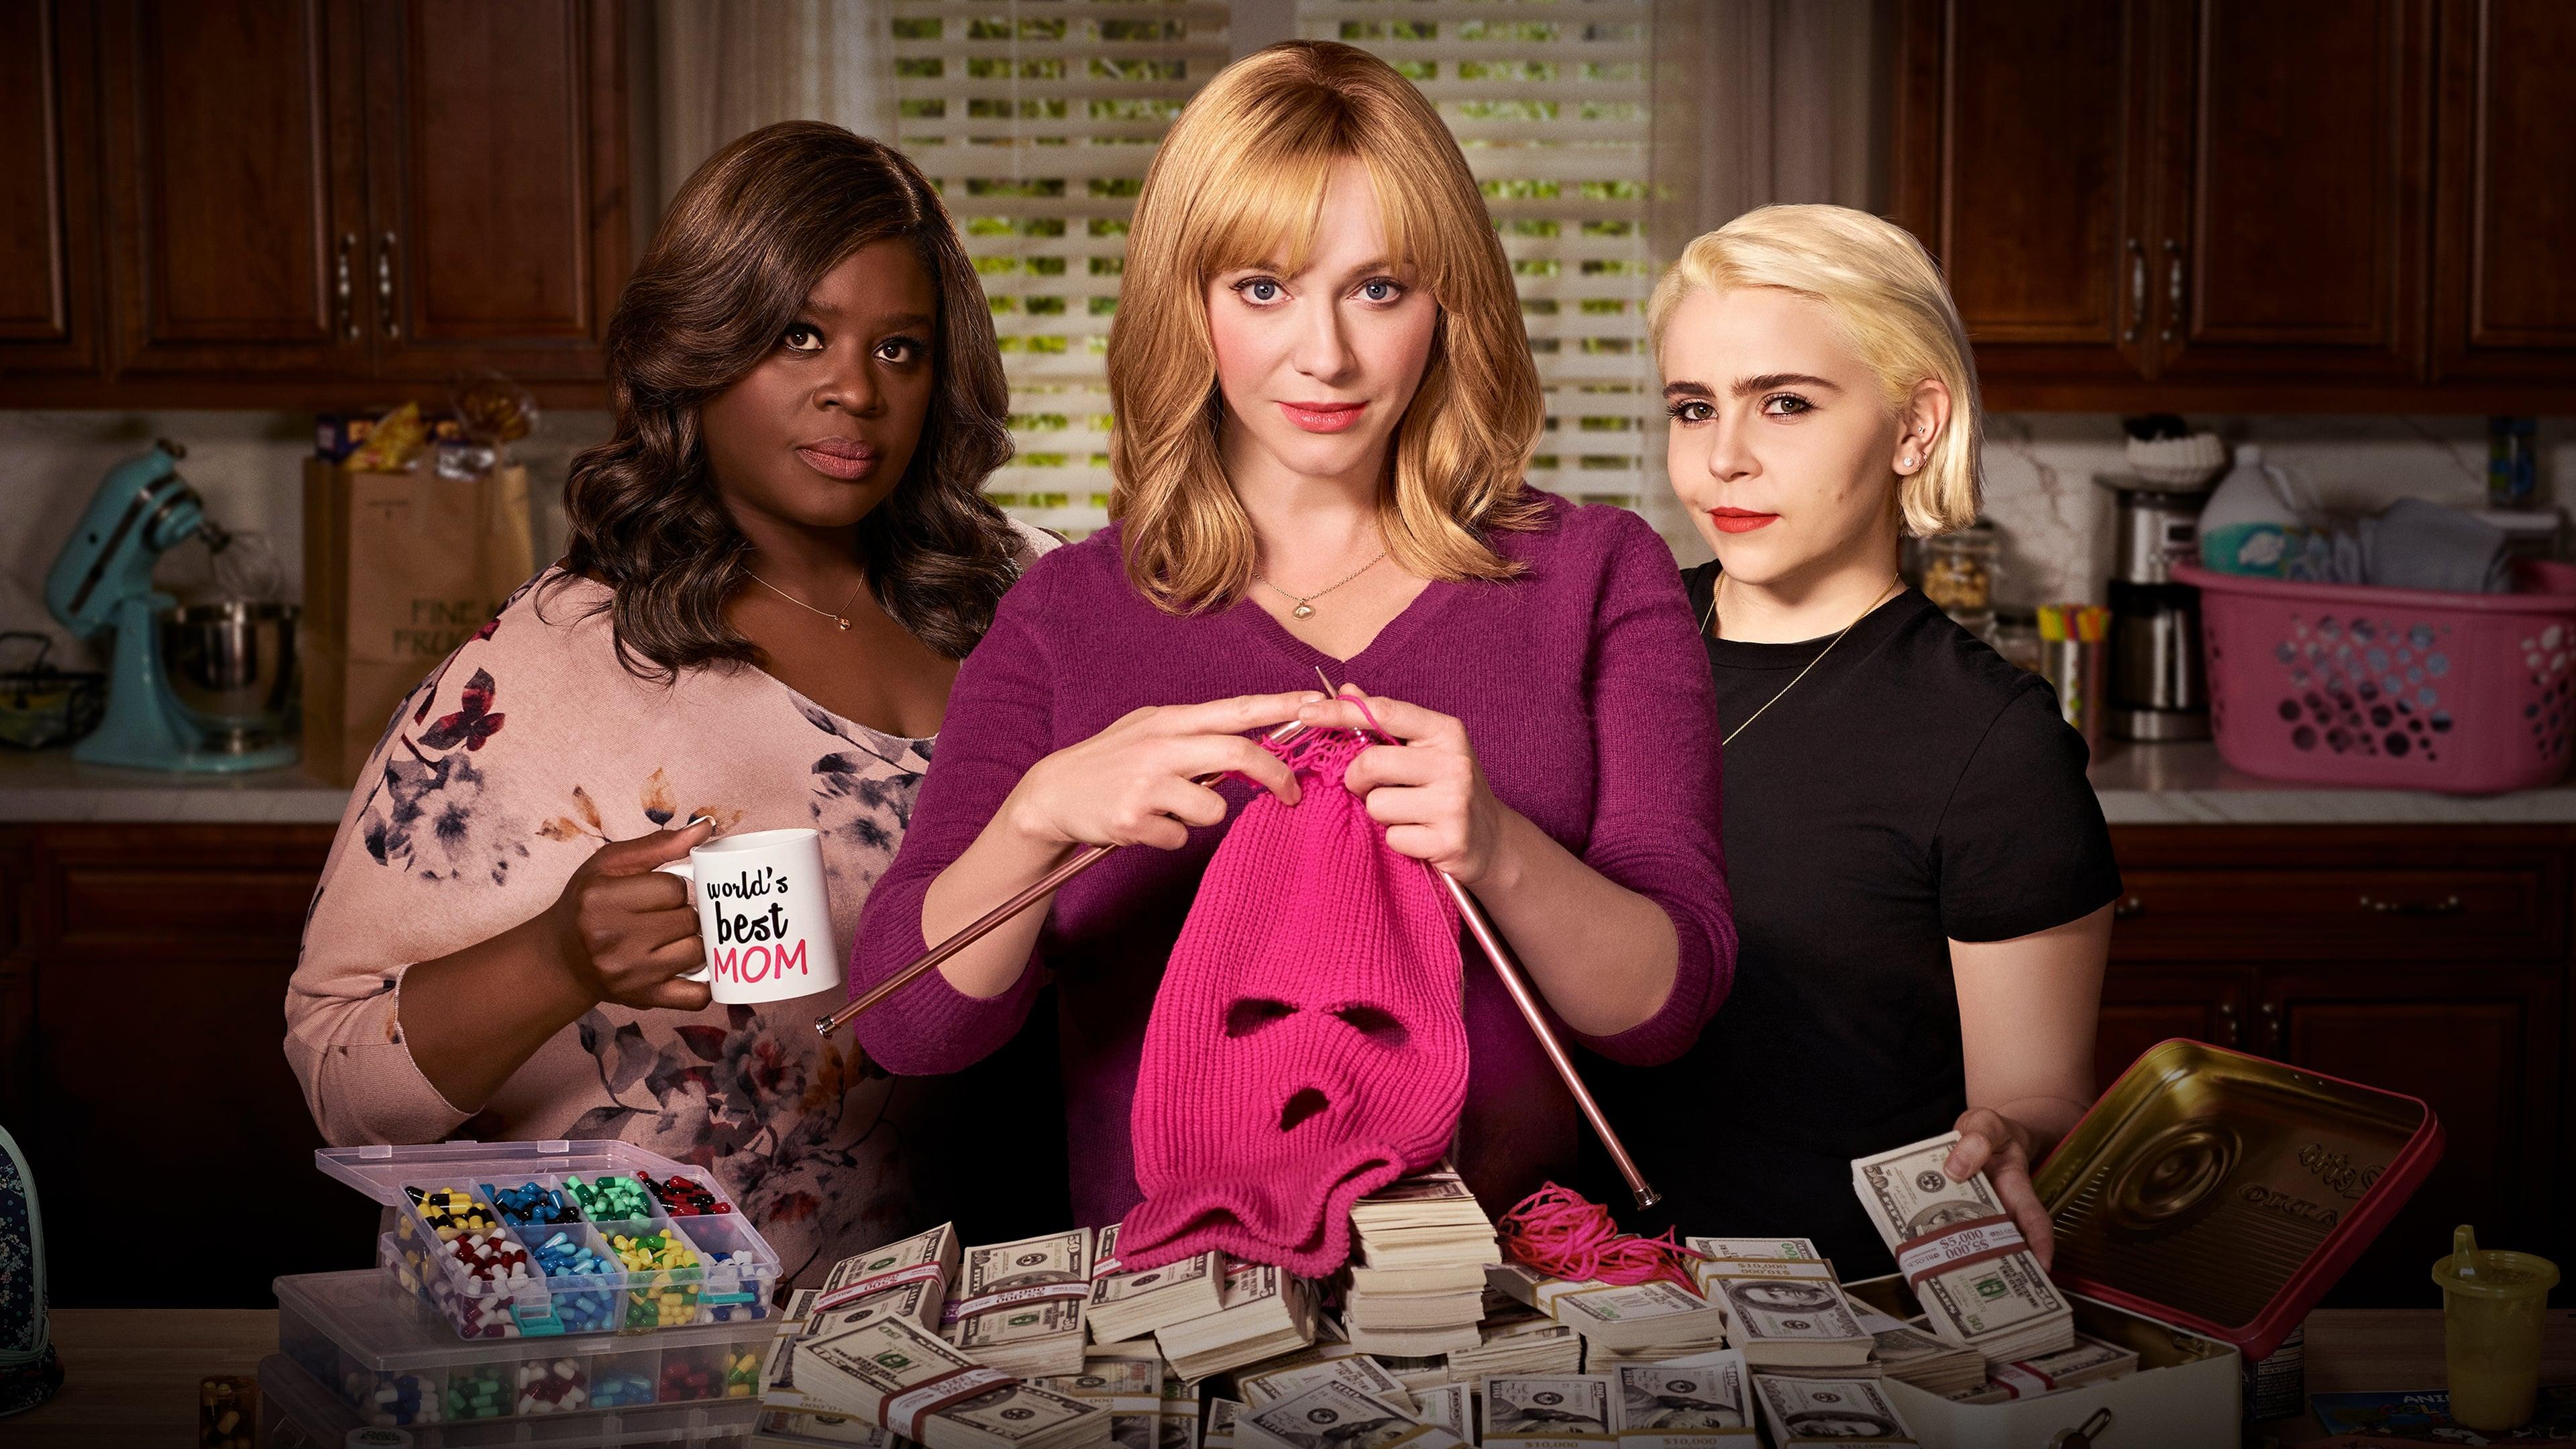 Derde seizoen Good Girls verschijnt eind juli op Netflix